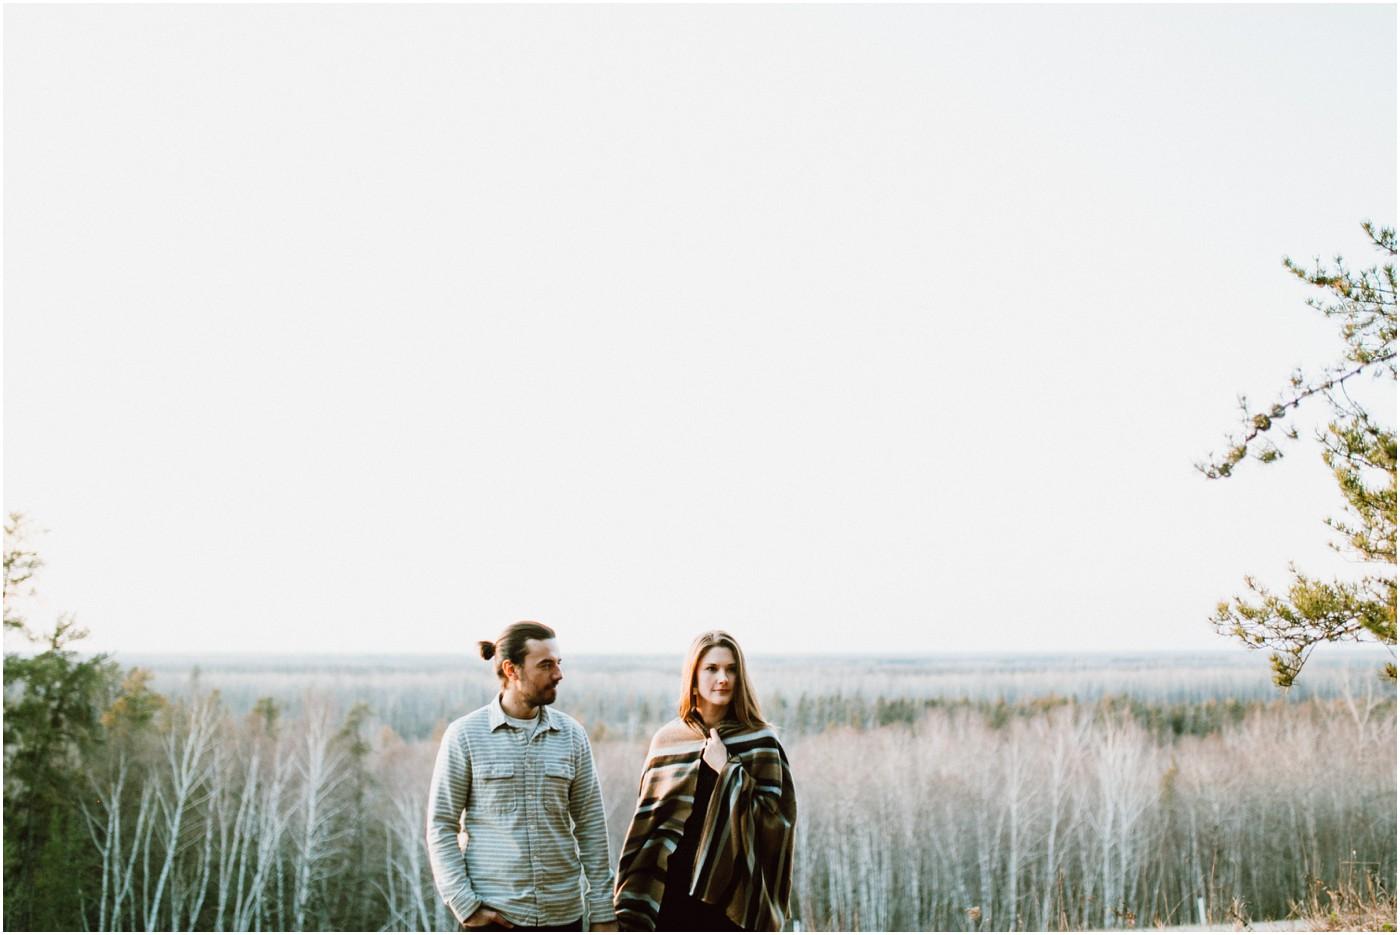 Manitoba Couple Photo Session